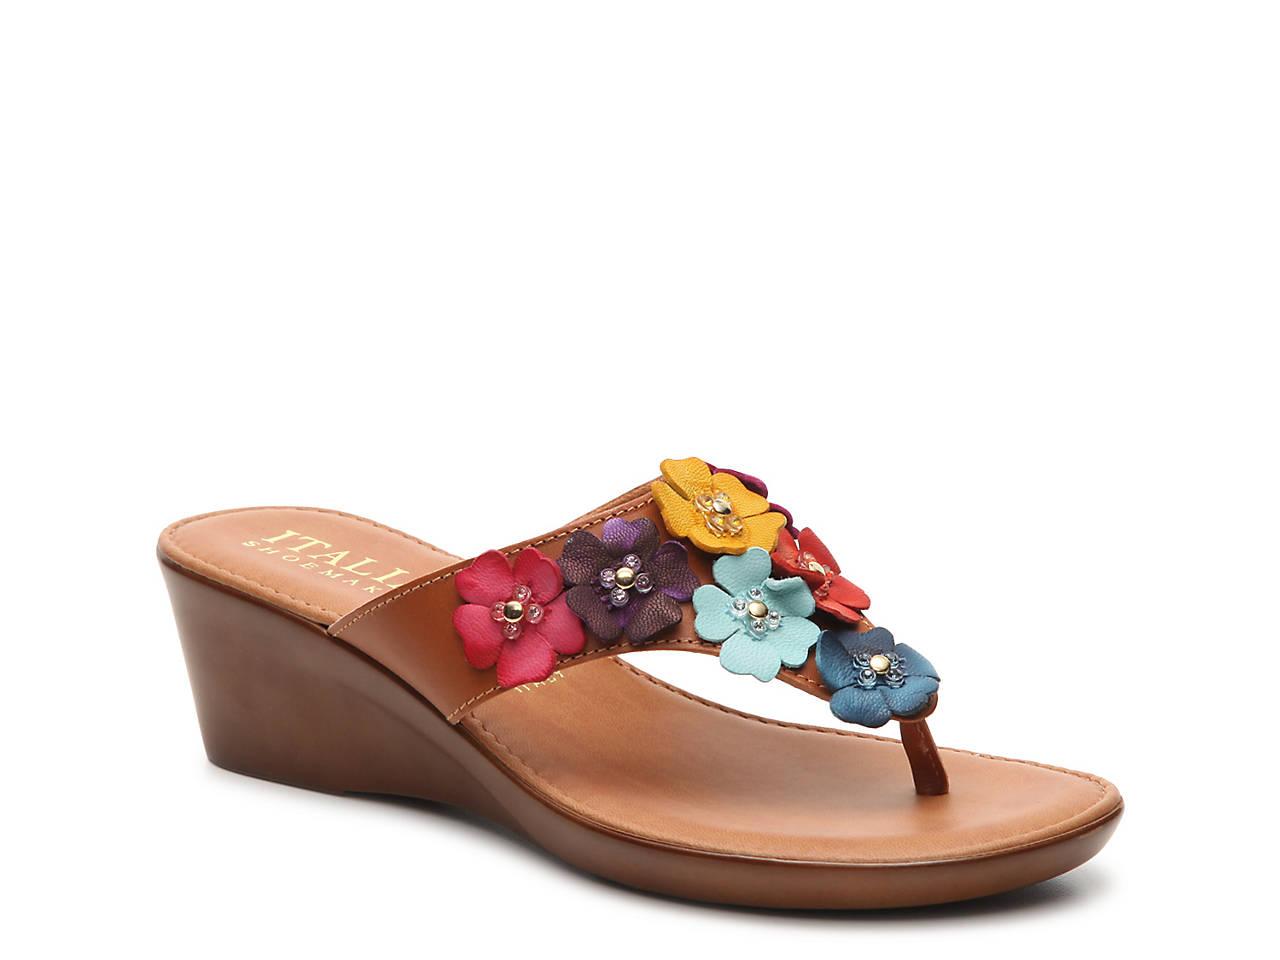 e4ced852a512 Italian Shoemakers Gisselle Wedge Sandal Women s Shoes